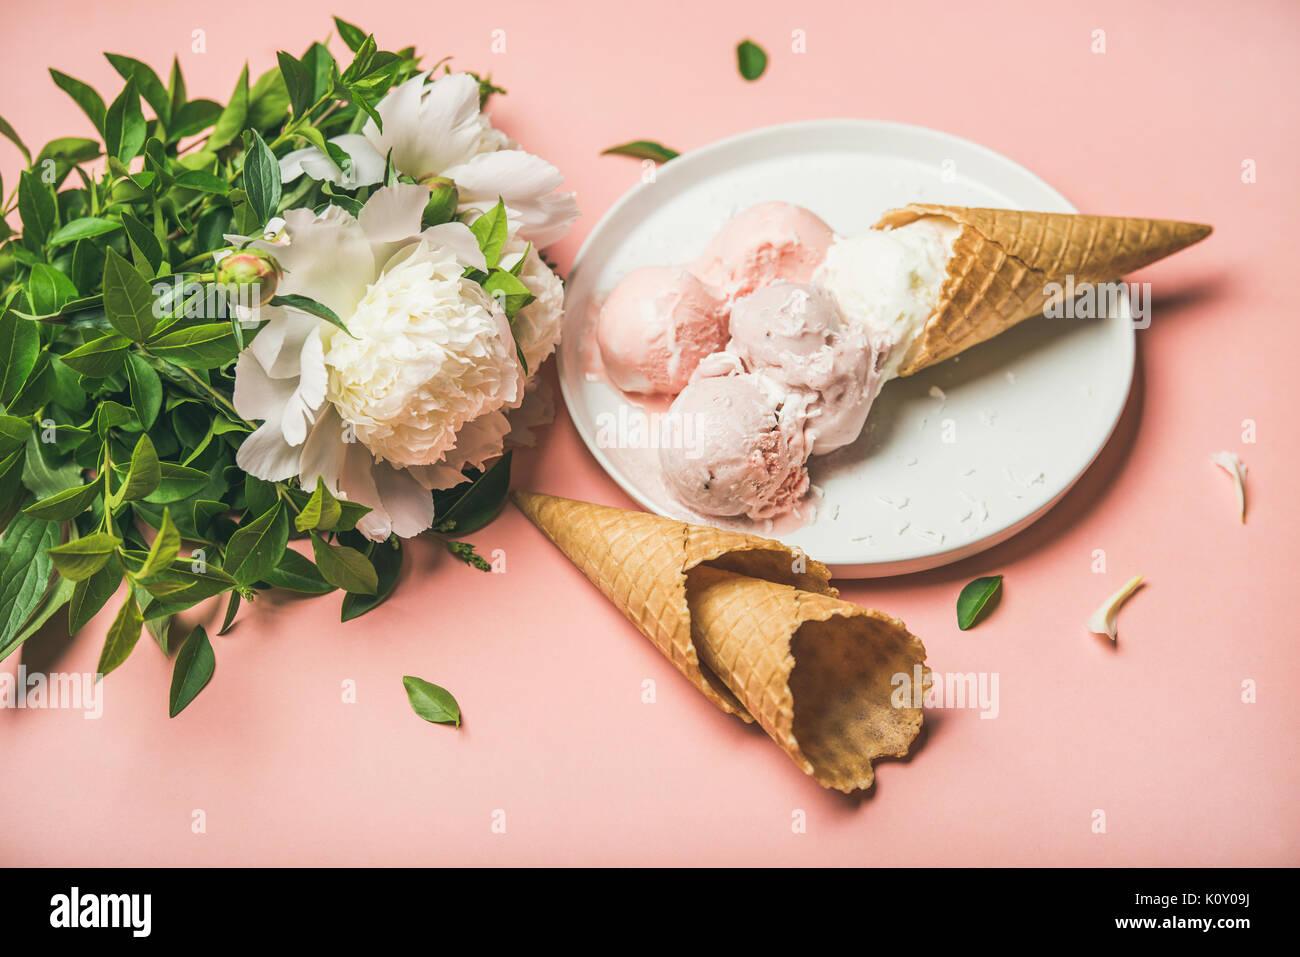 Erdbeere und Kokos-eis, Kegel, weiße Pfingstrose Blüten Stockbild